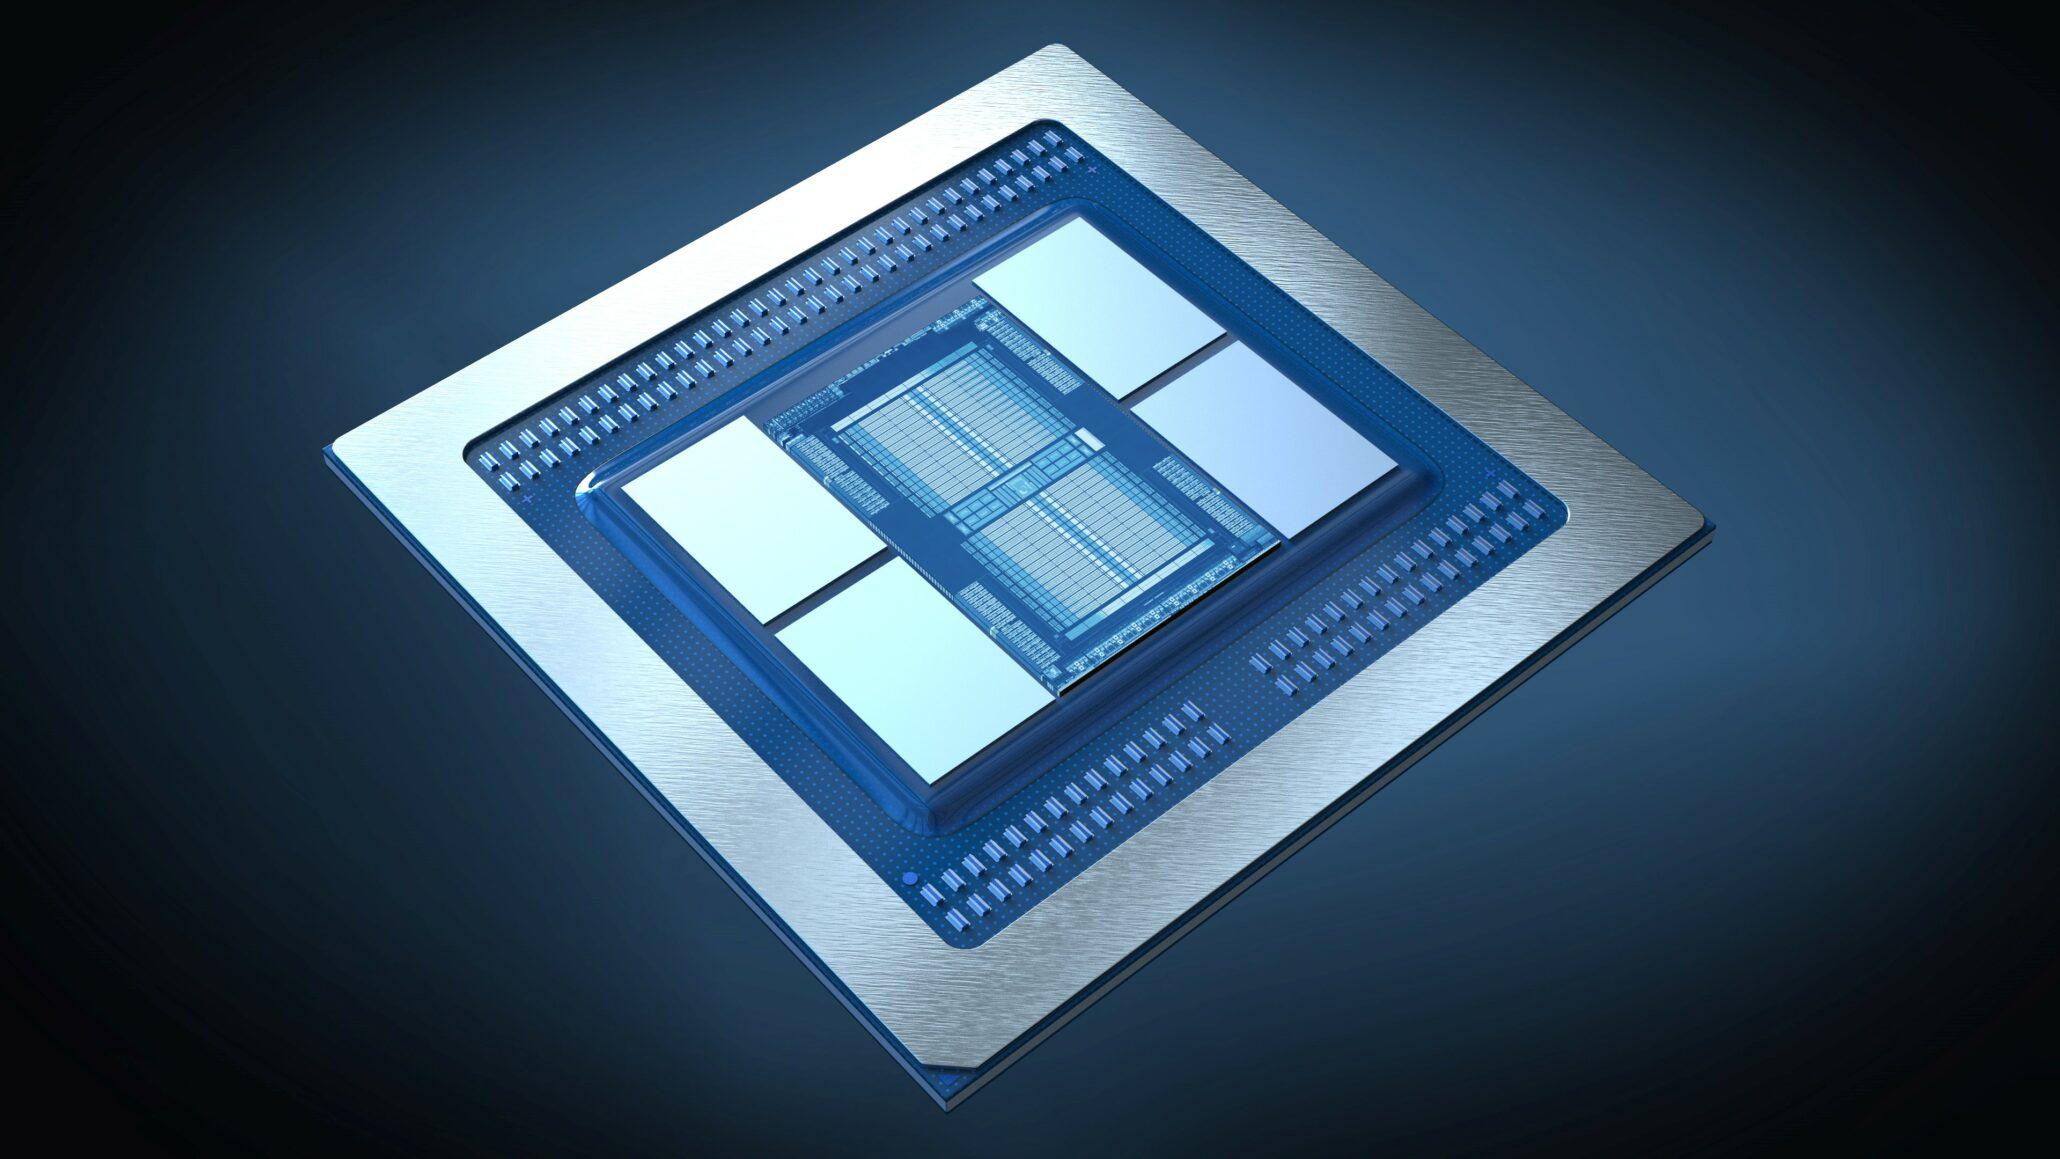 Amd Radeon Instinct Mi60 Hpc Graphics Card With 32 Gb Hbm2 Official